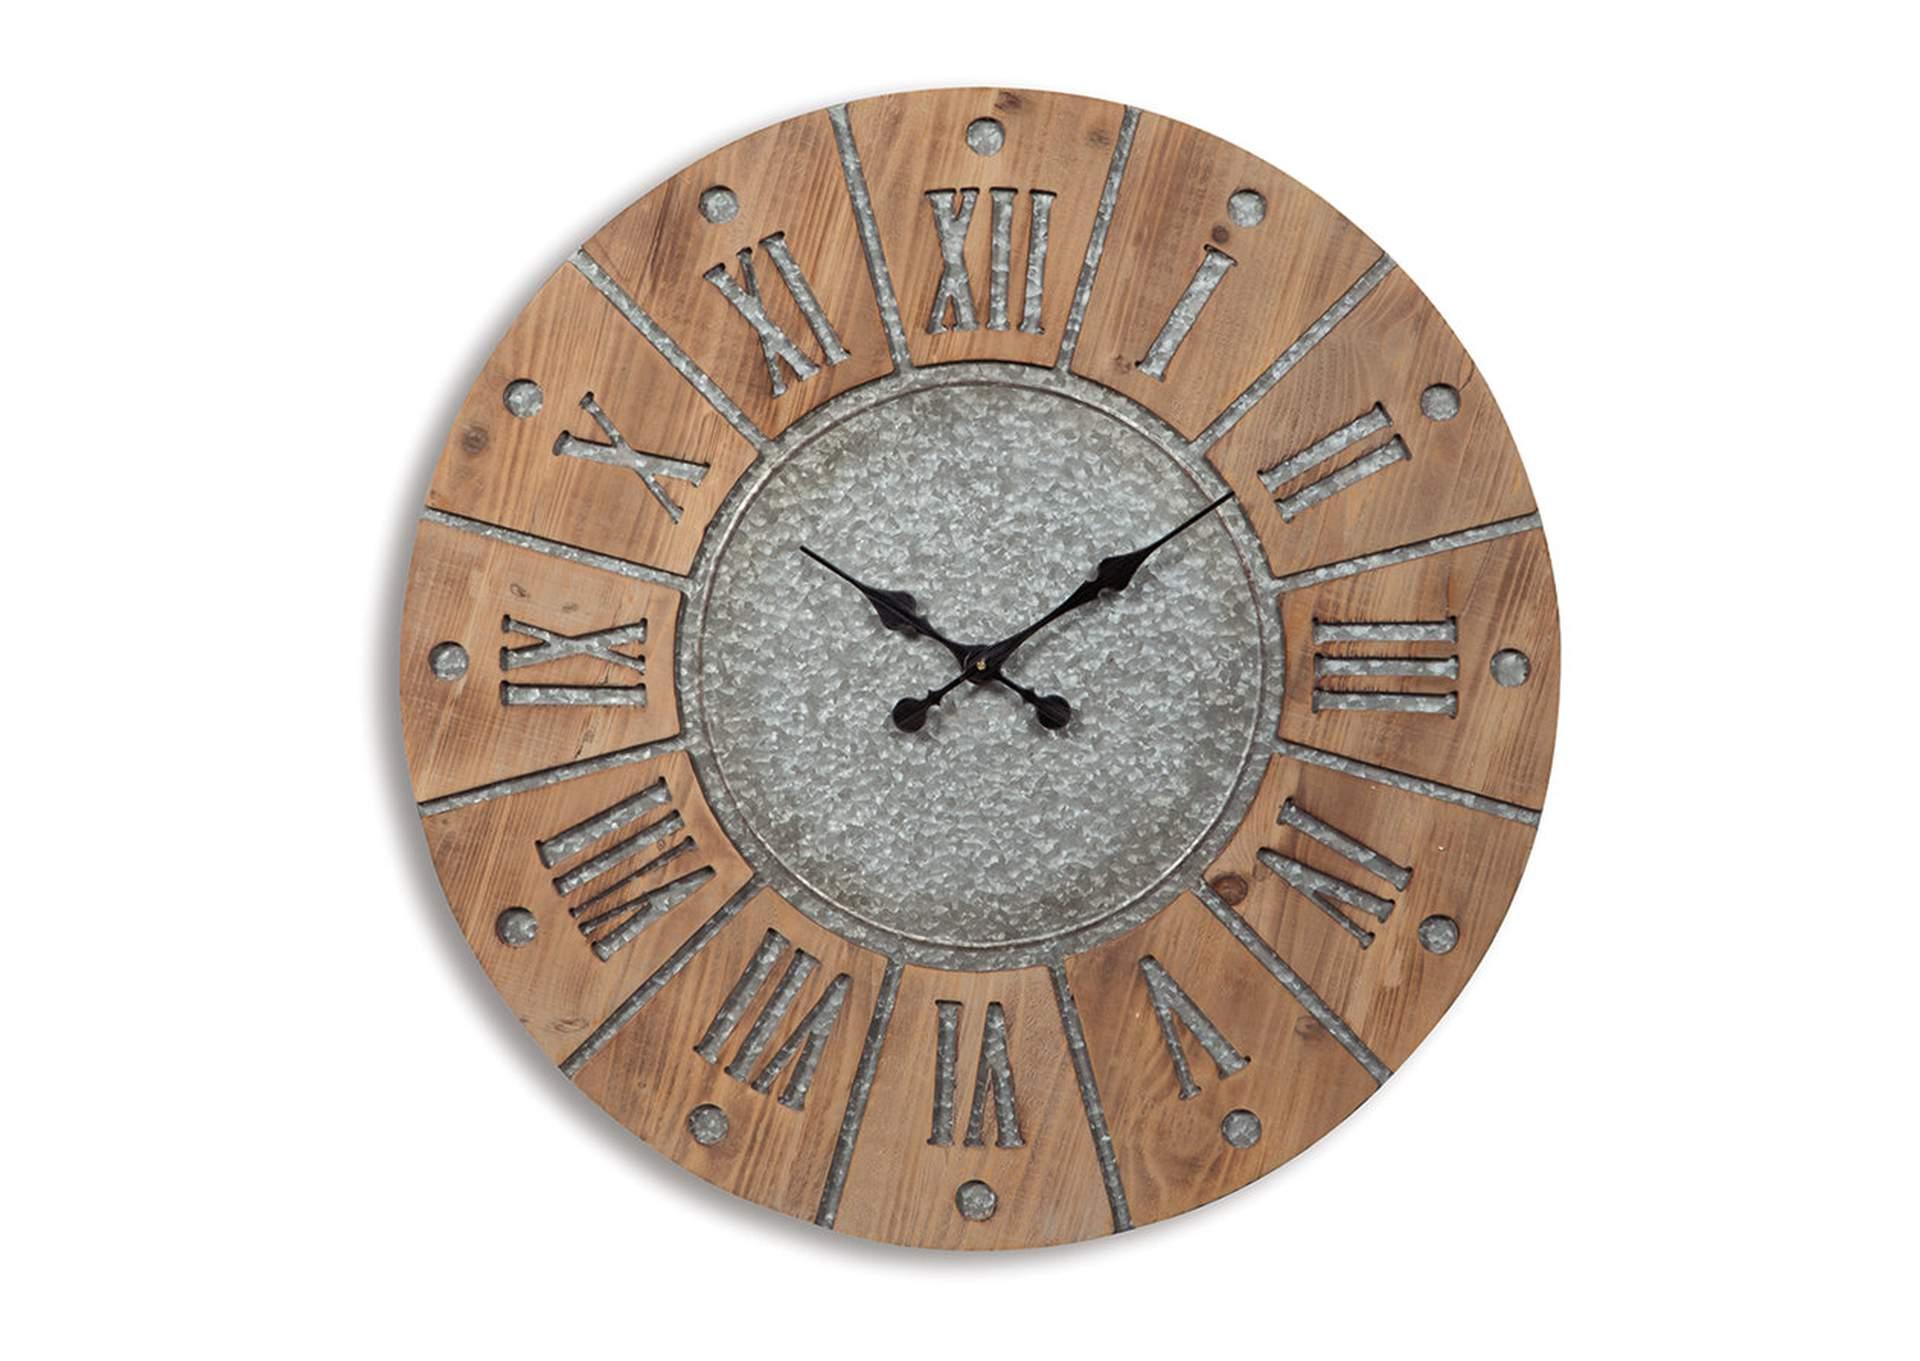 Reloj de pared Payson en gris/natural antiguo   PEDIDO ESPECIAL